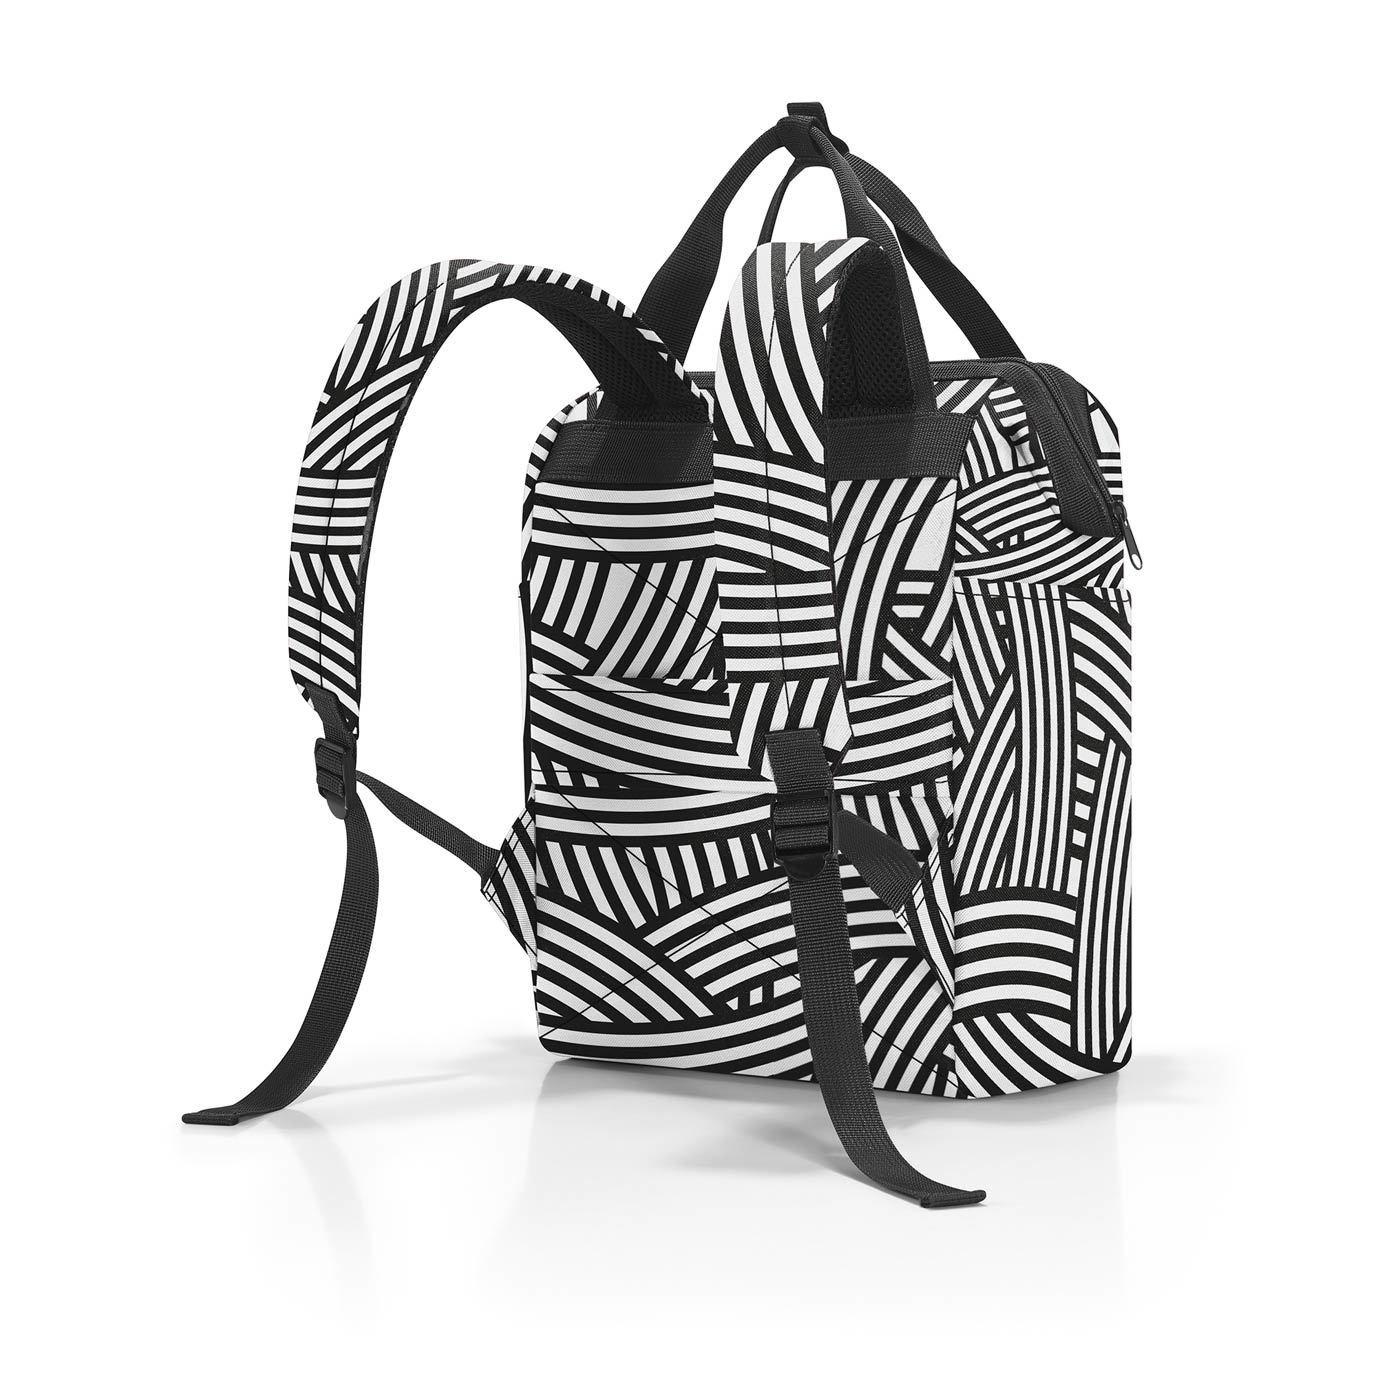 Batoh/taška Allrounder R zebra_0